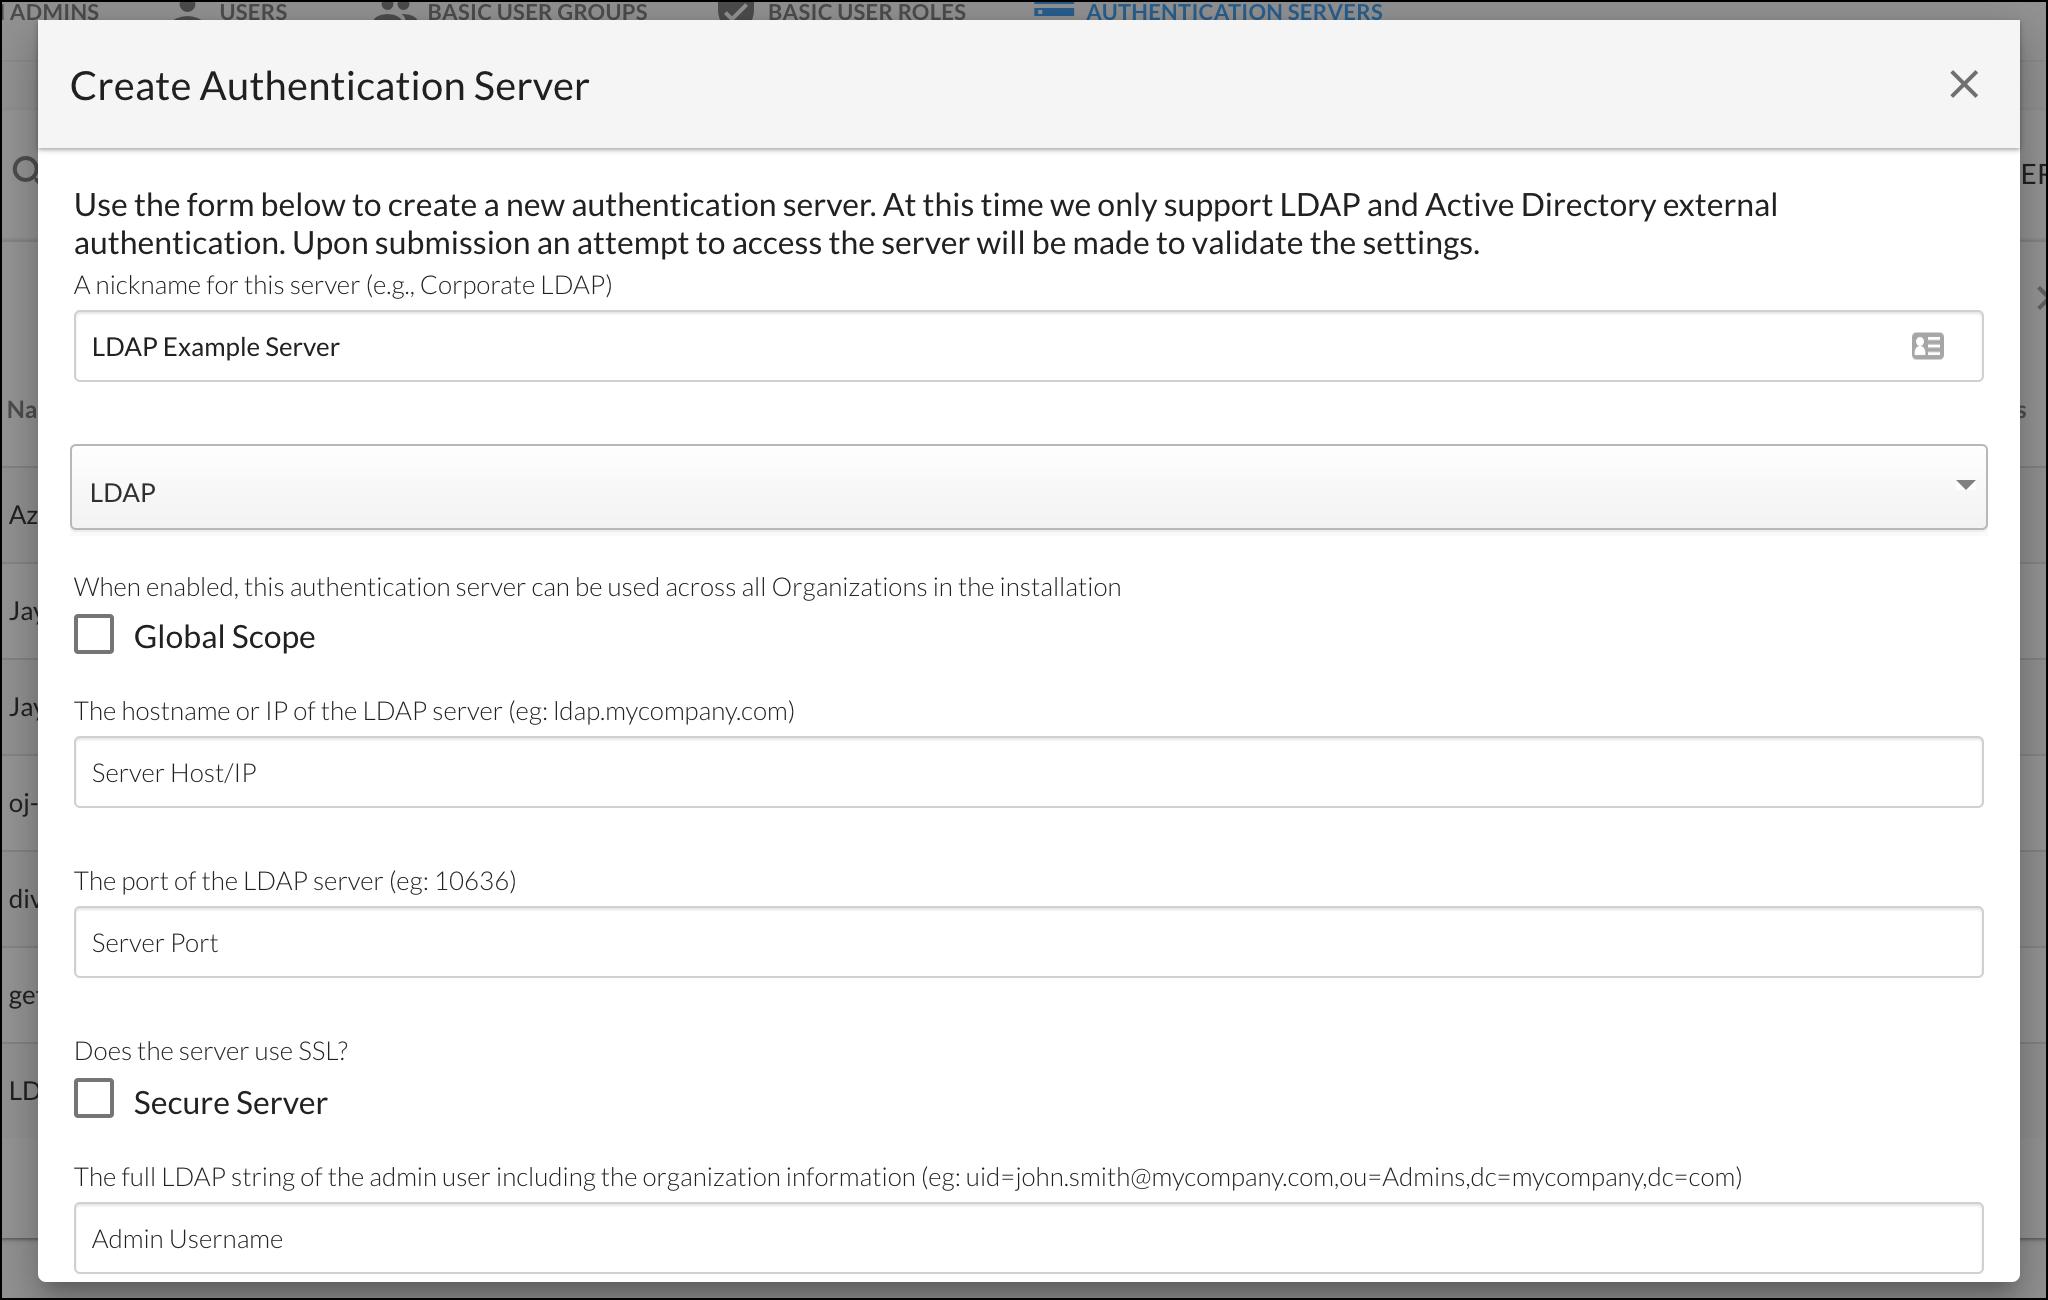 Create Authentication Server - LDAP Example